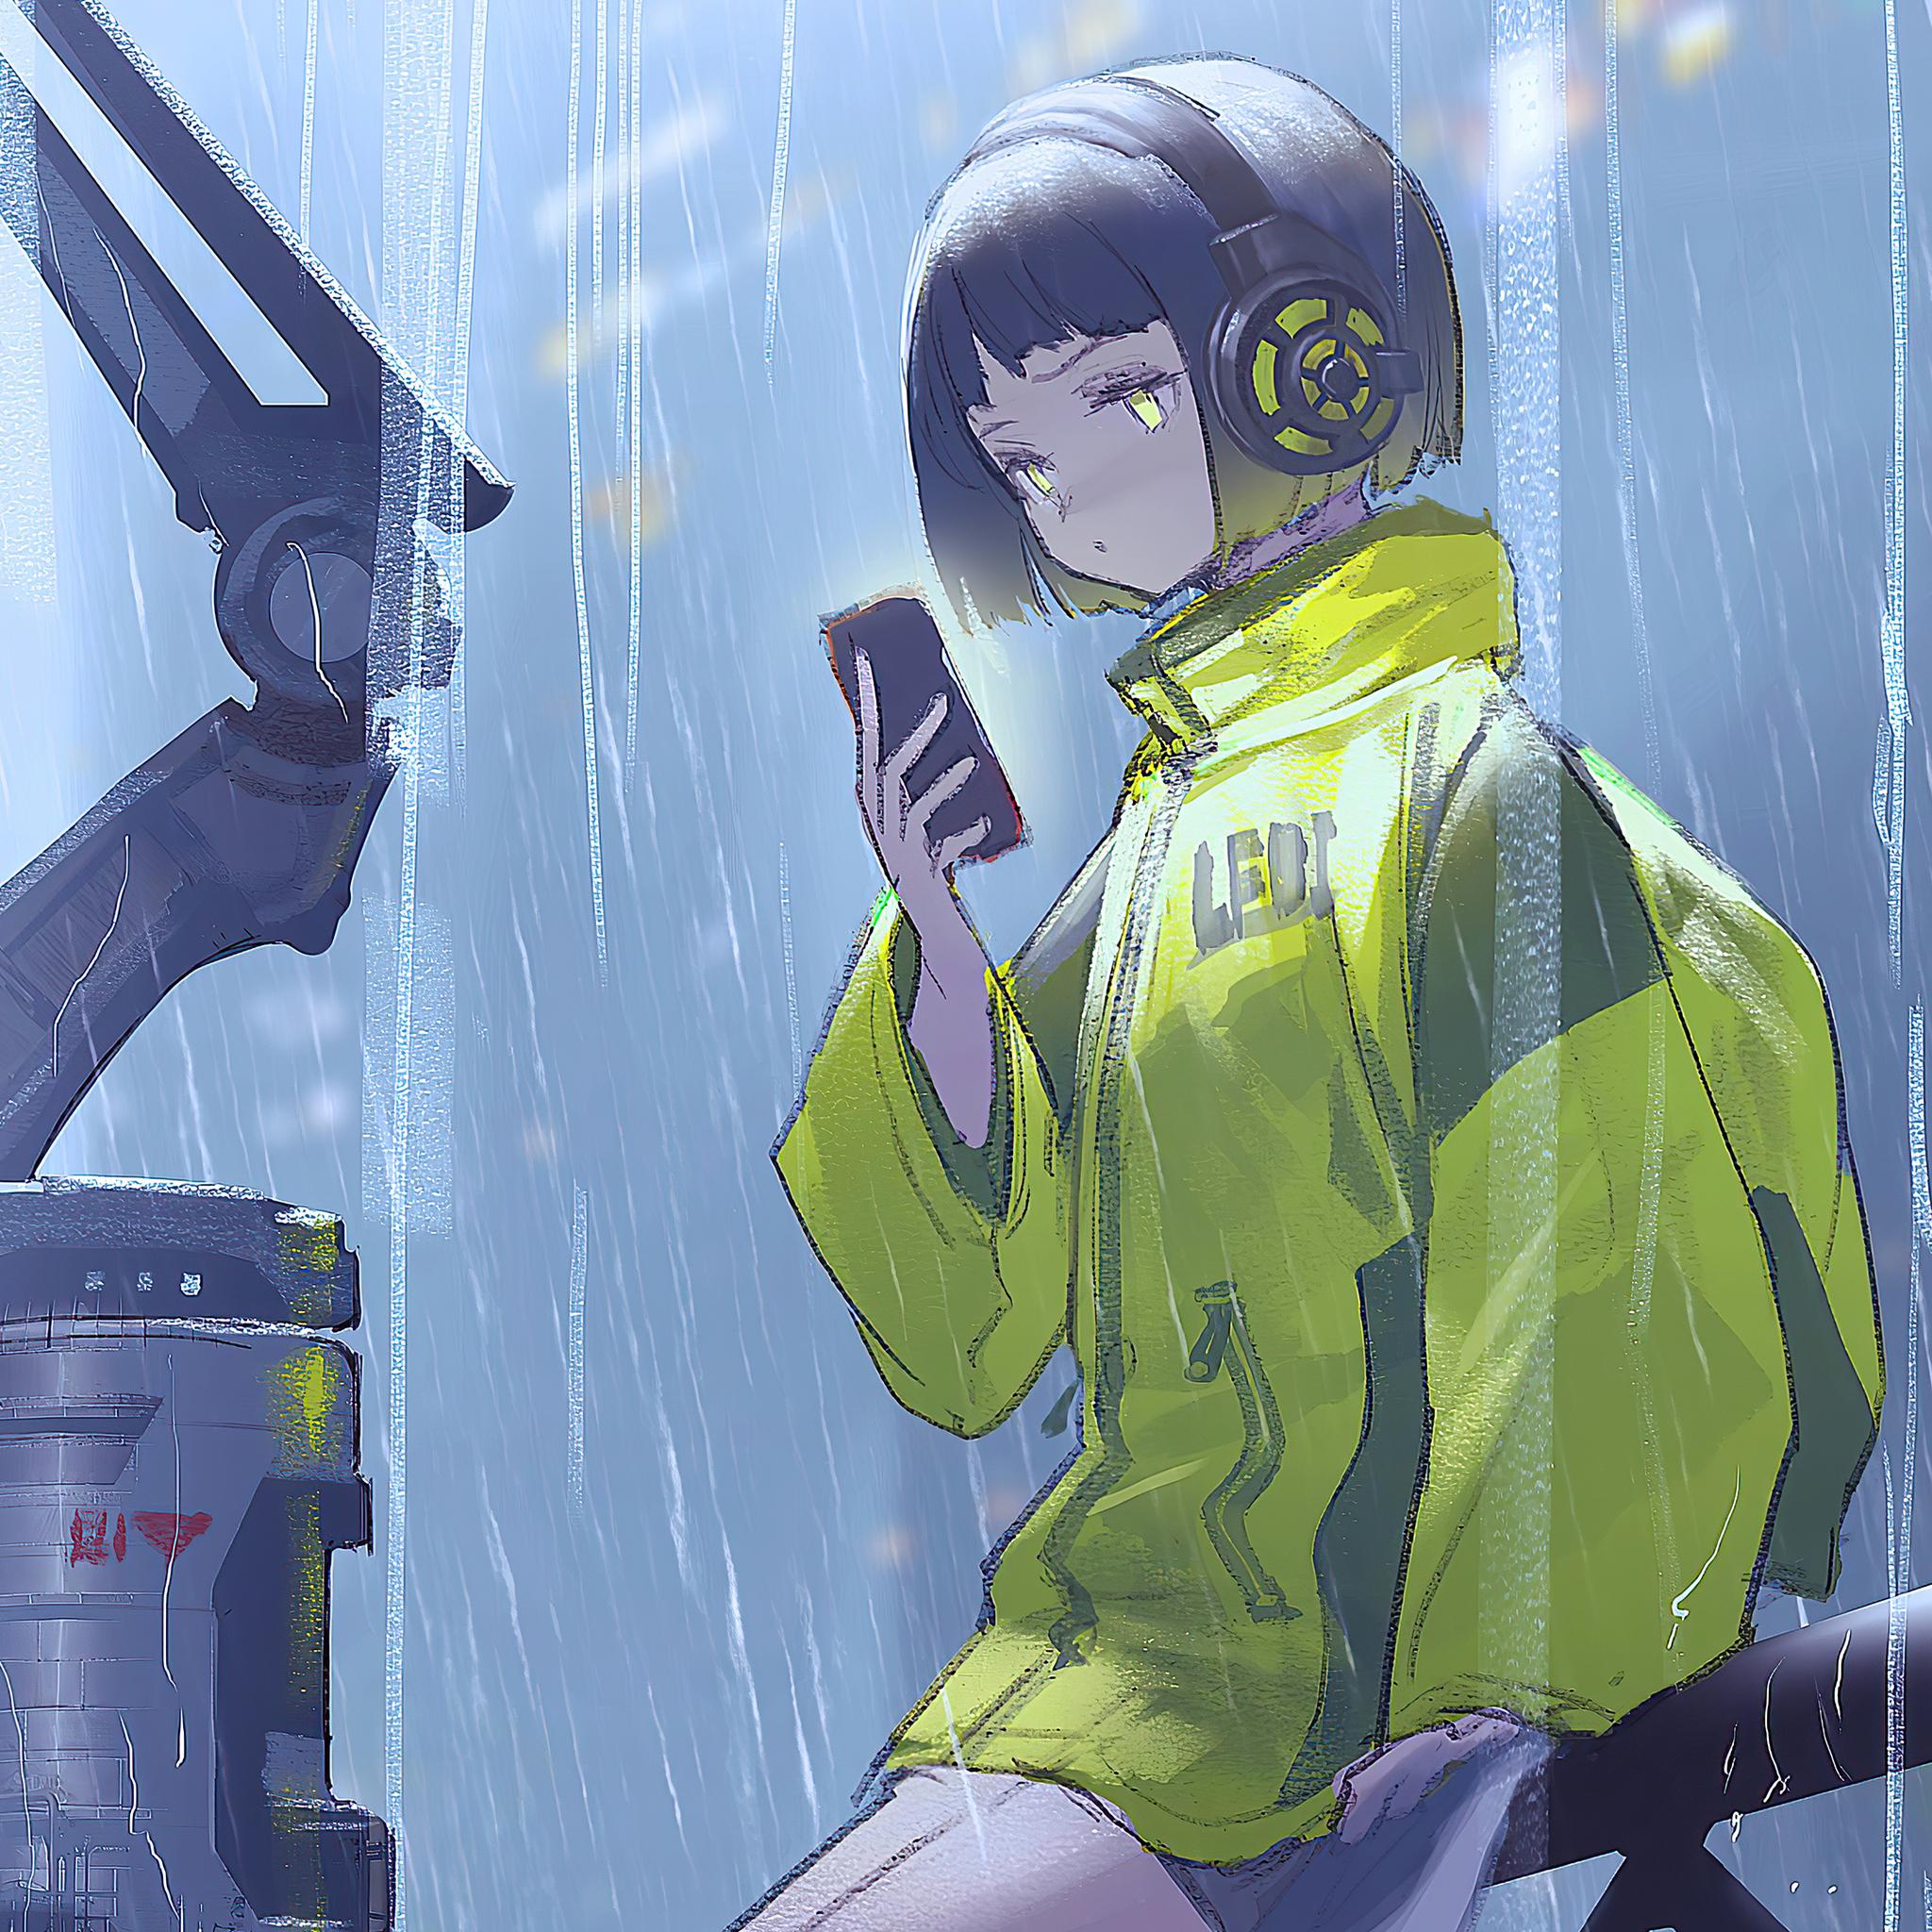 2048x2048 Anime Girl Scifi Umbrella Rain 4k Ipad Air HD 4k ...